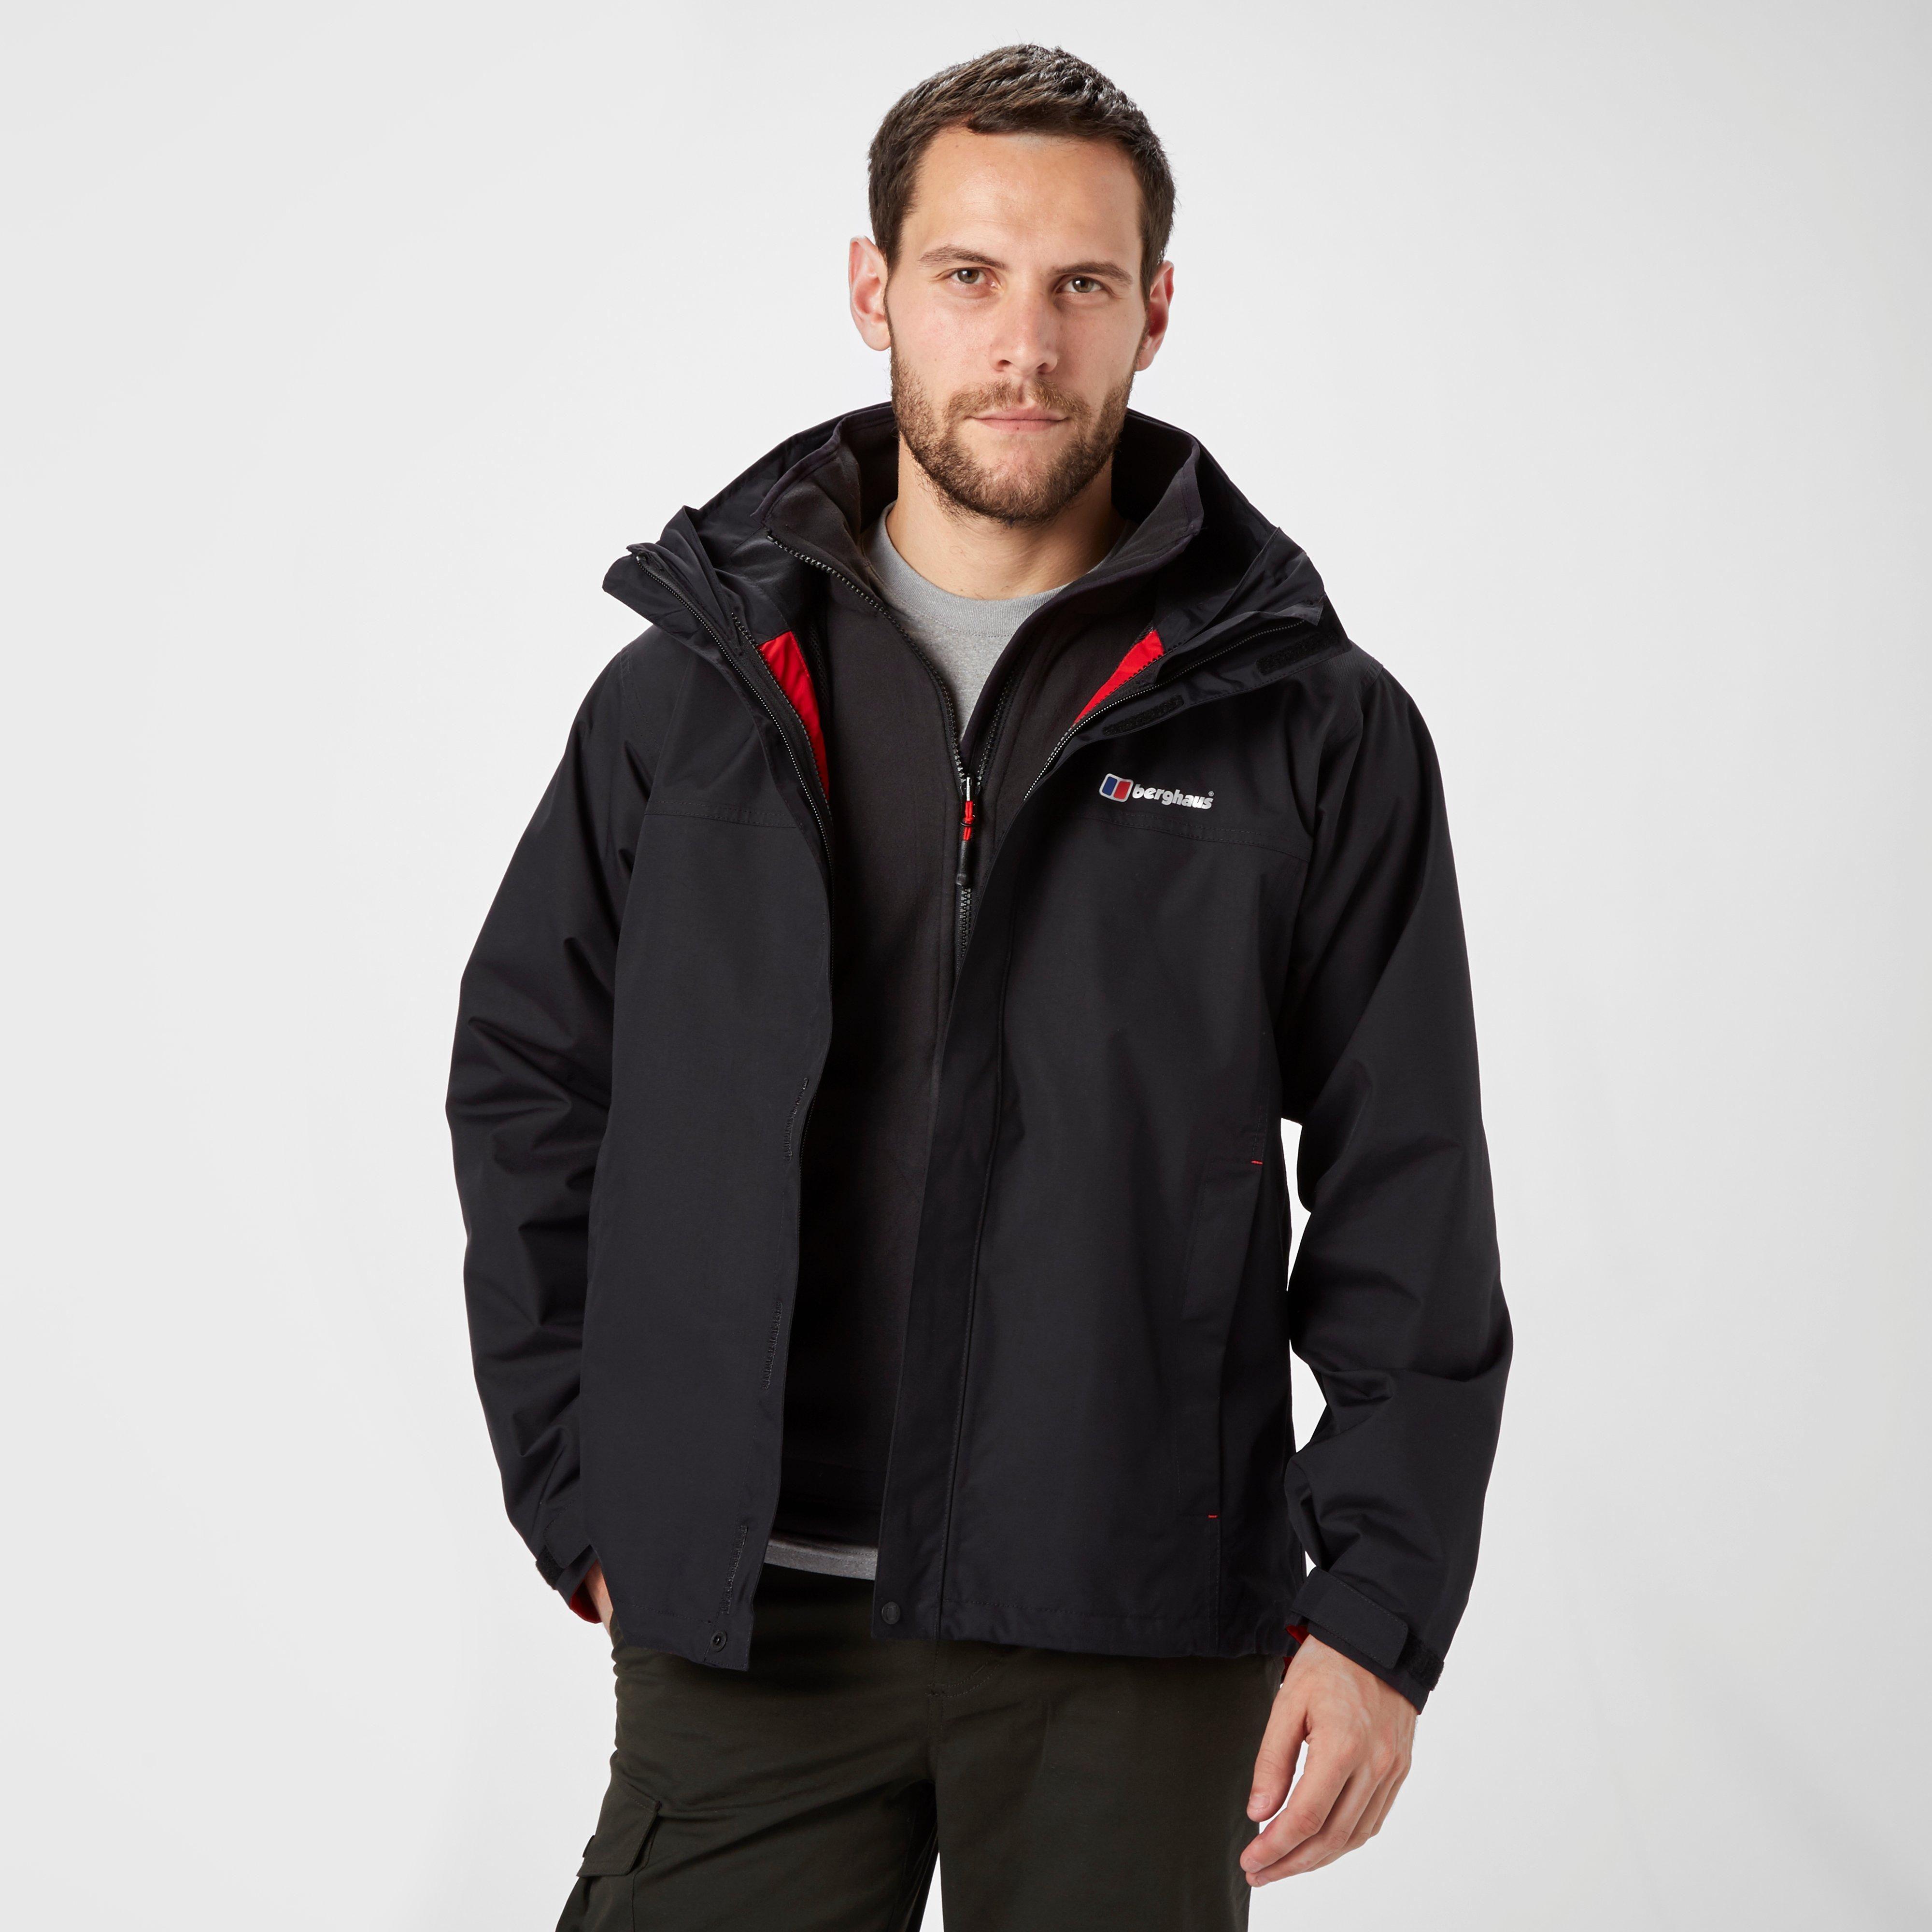 exclusive range official site in stock Berghaus Men's RG Delta 3 in 1 AQ2 Jacket, Black ...